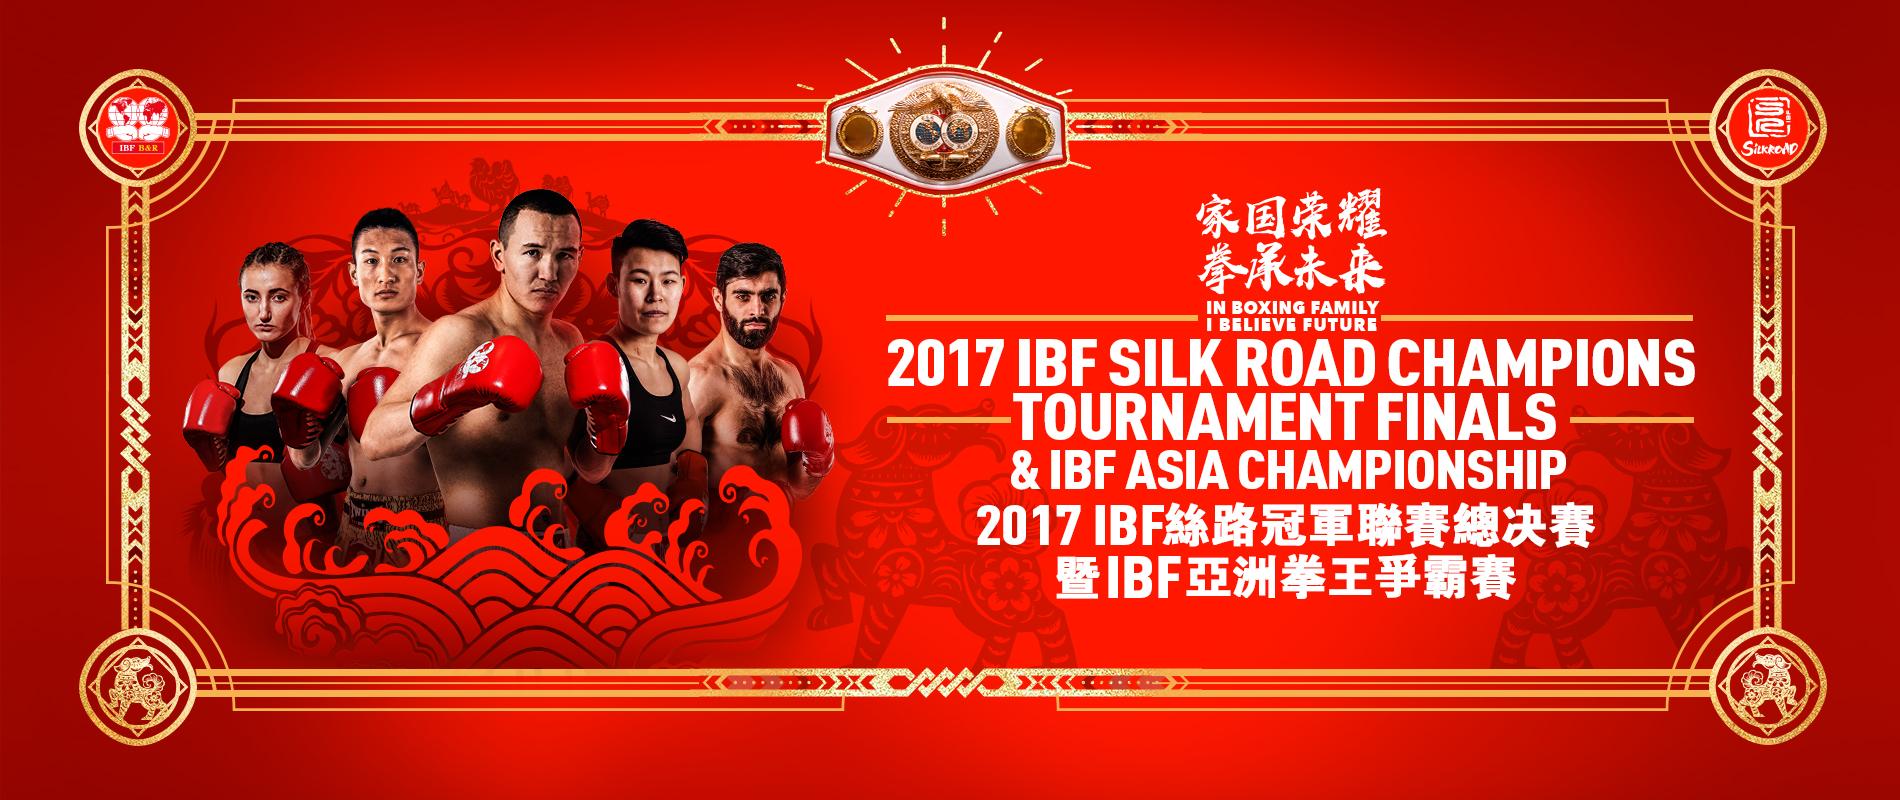 2017 IBF 絲路冠軍聯賽總決賽暨IBF亞洲拳王爭霸賽